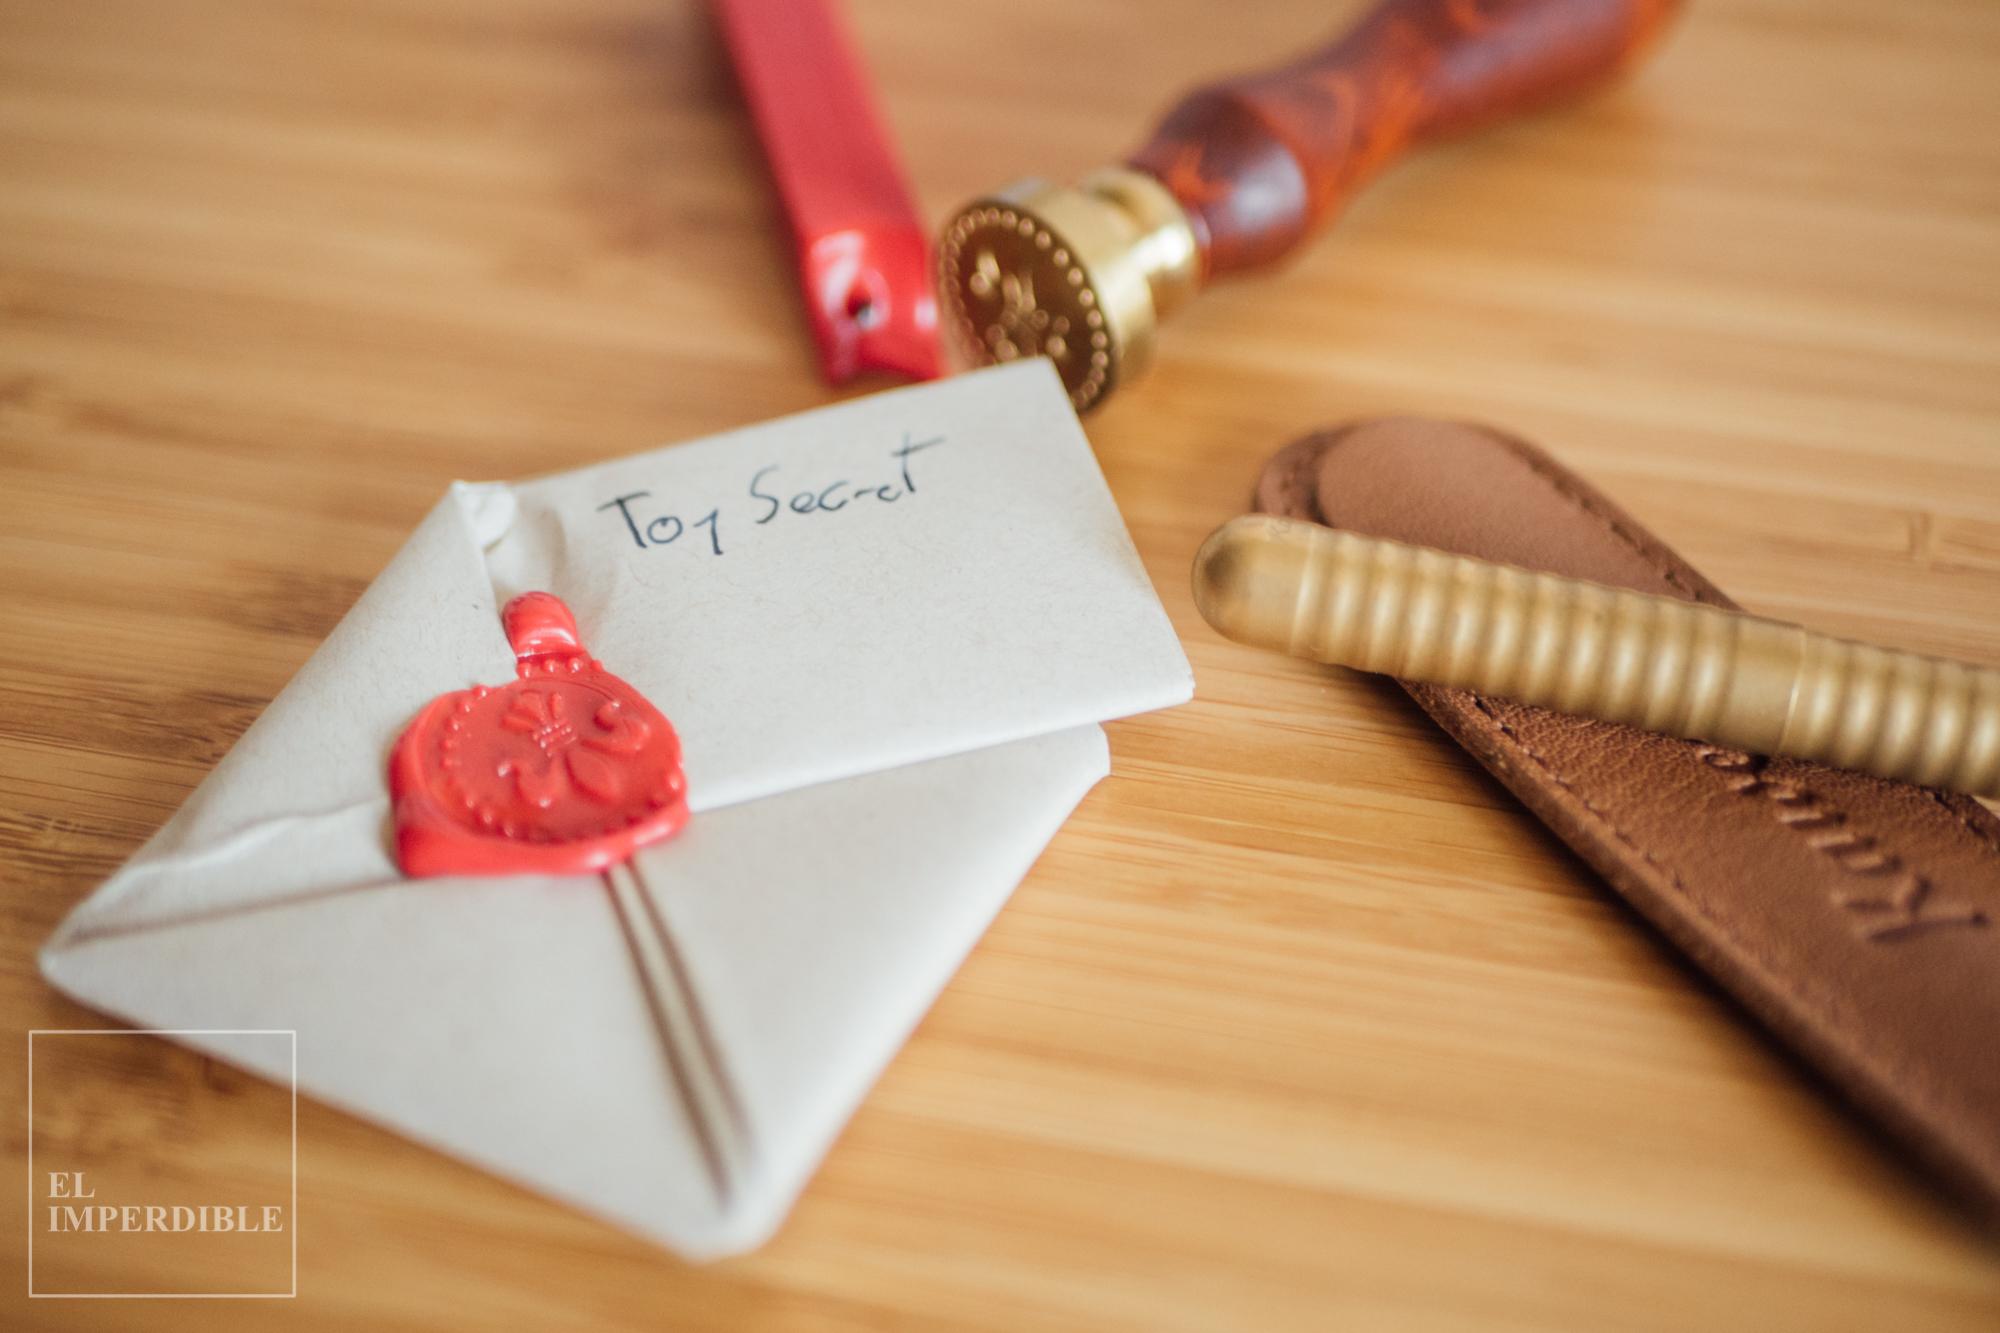 cómo escribir notas secretas con texto cifrado